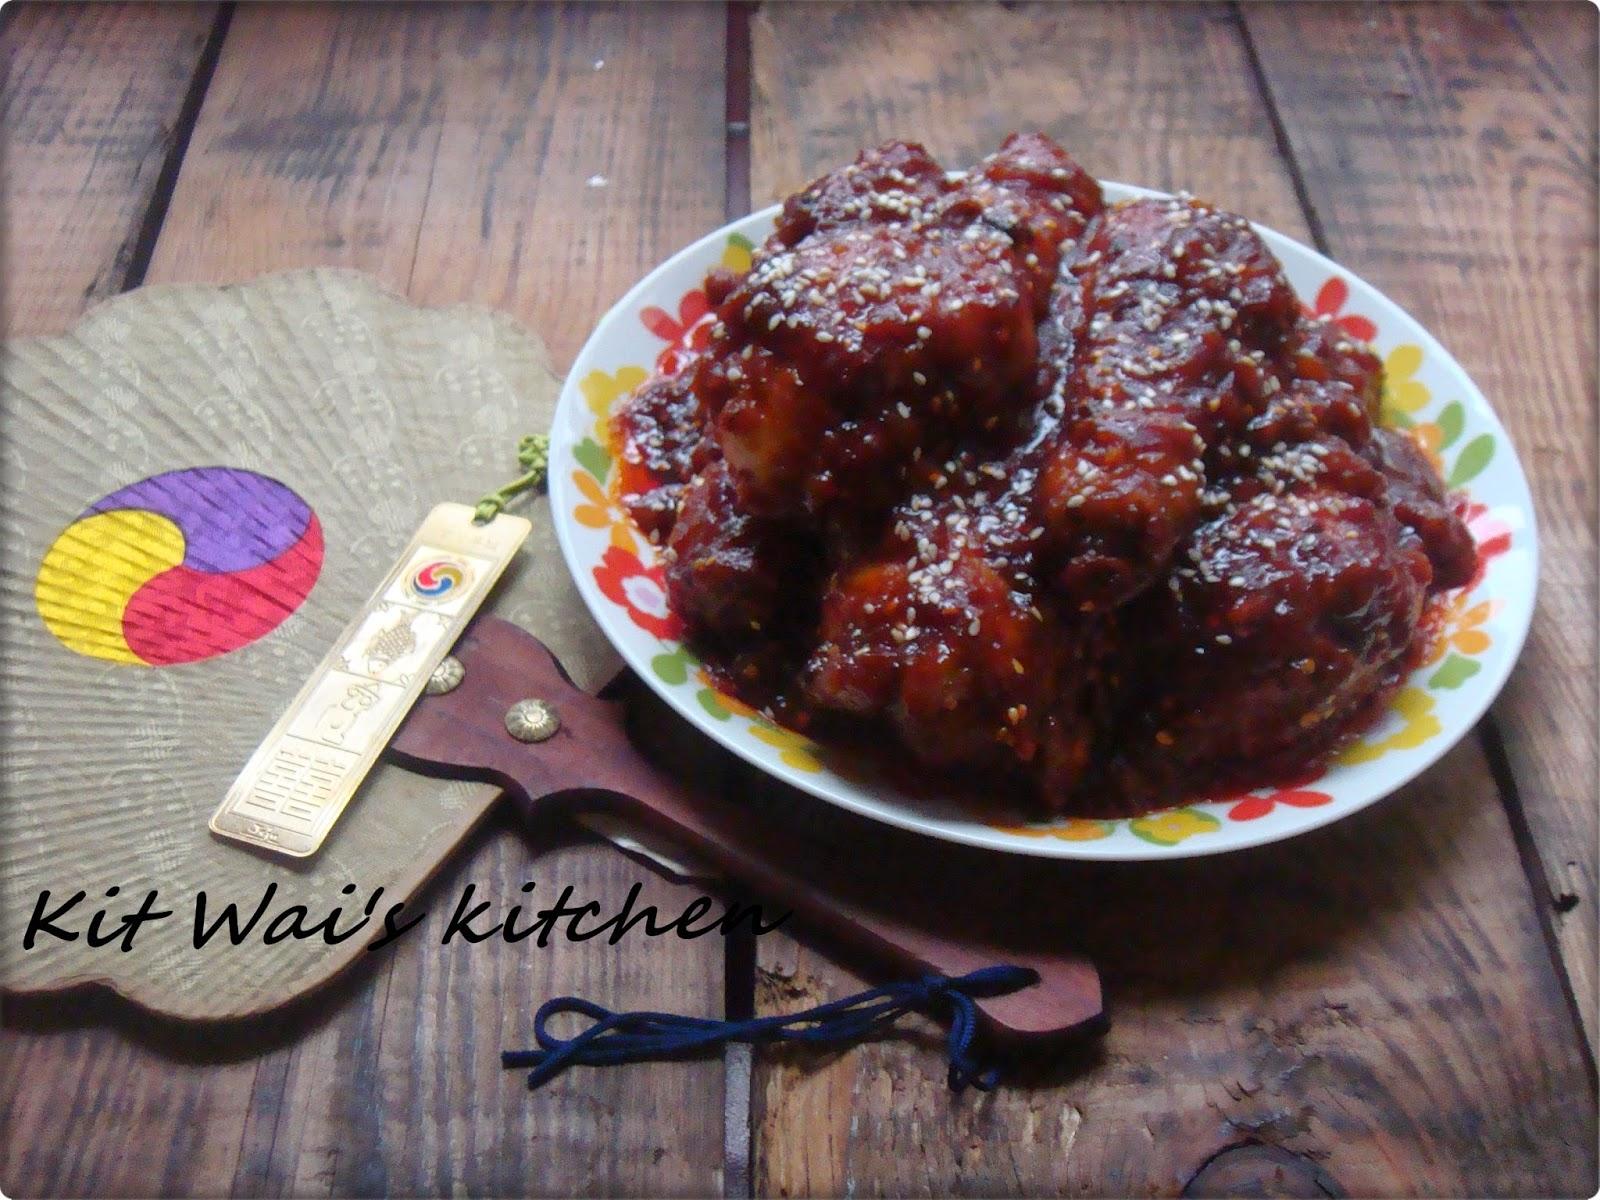 Kit Wai's kitchen : 韩式辣味炸鸡 ~ Korean Fried Chicken ...